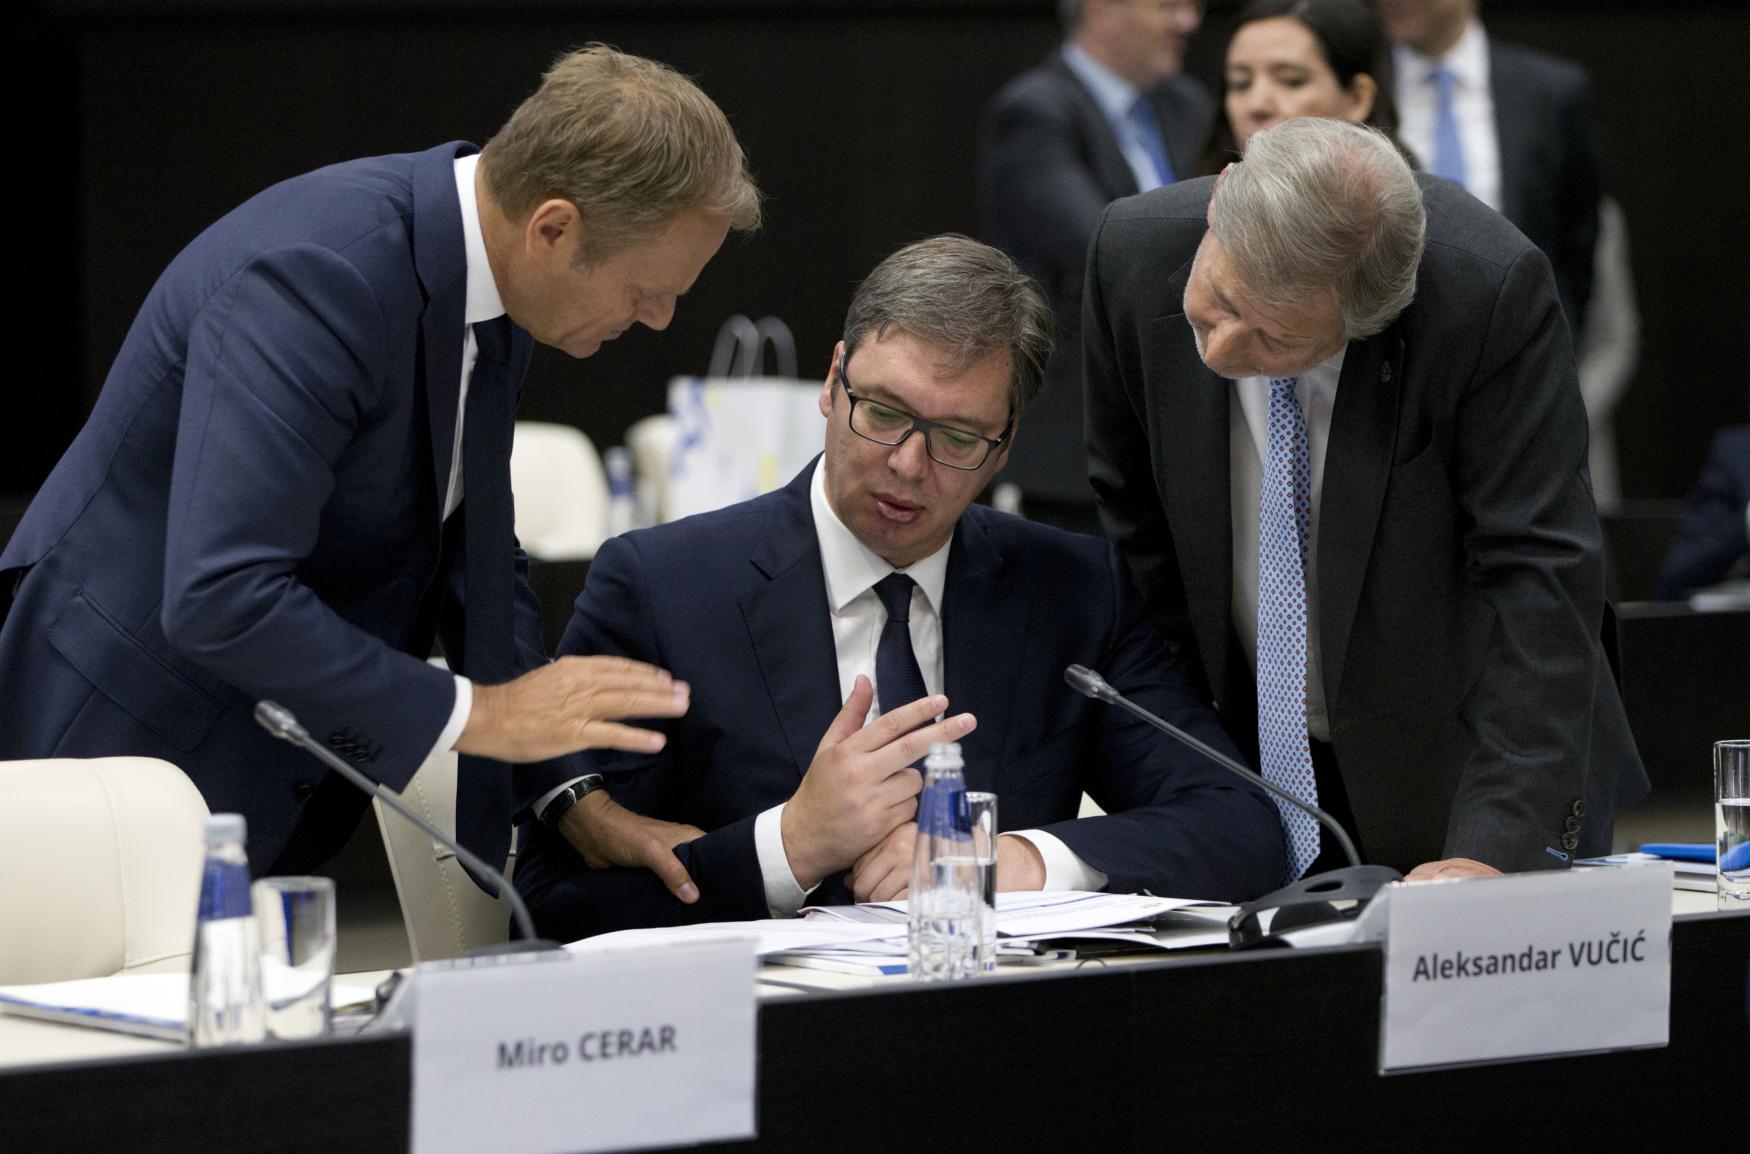 Aleksandar Vučić shrnul rozšířené obavy řady členských států EU